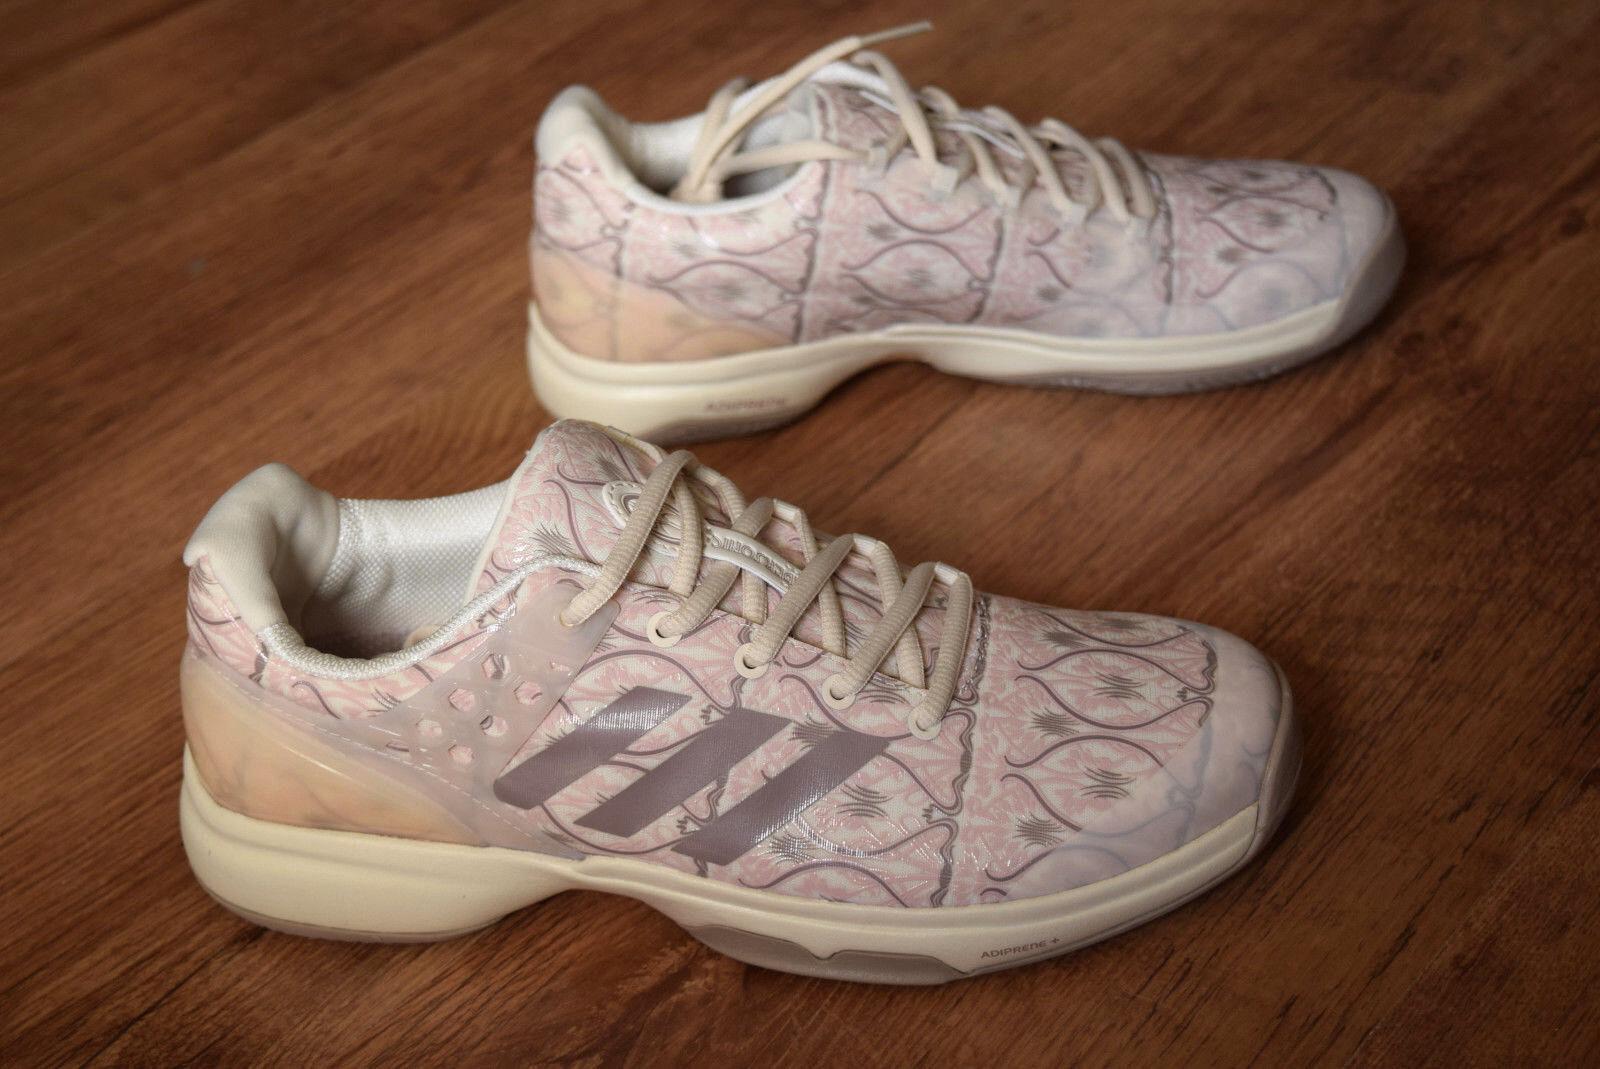 Adidas adizero 40,5 ubersonic 2 w Clay 37 38 38,5 40,5 adizero Tennis Barricade BB5819 6a1918